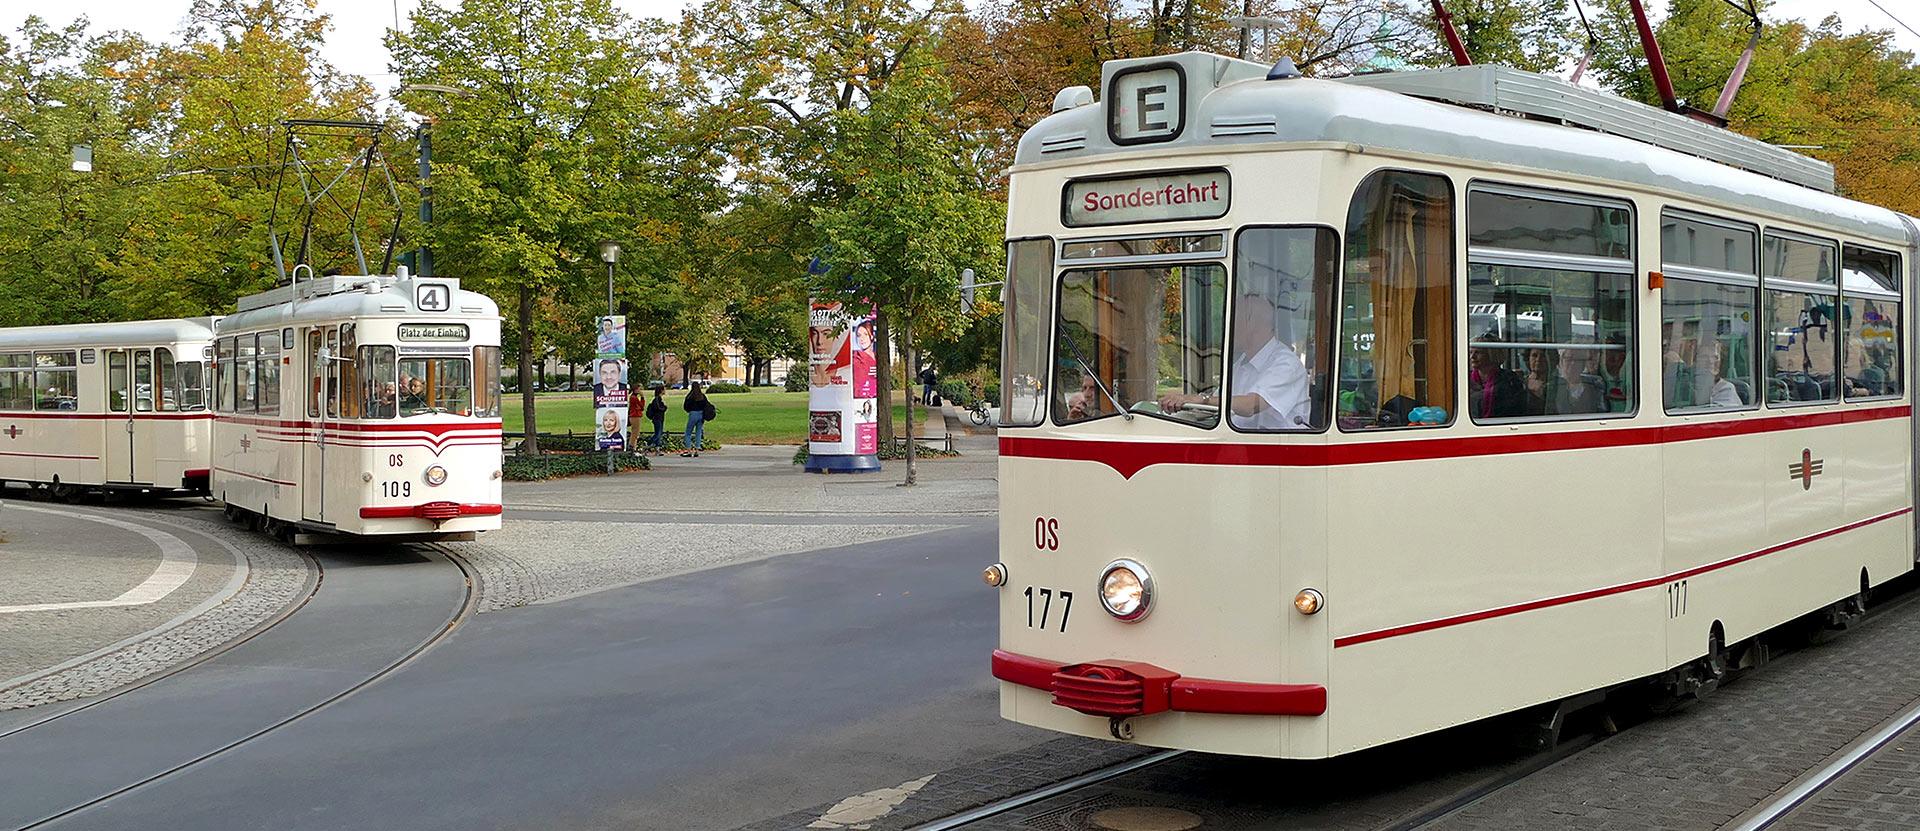 Straßenbahn am Nauener Tor in Potsdam